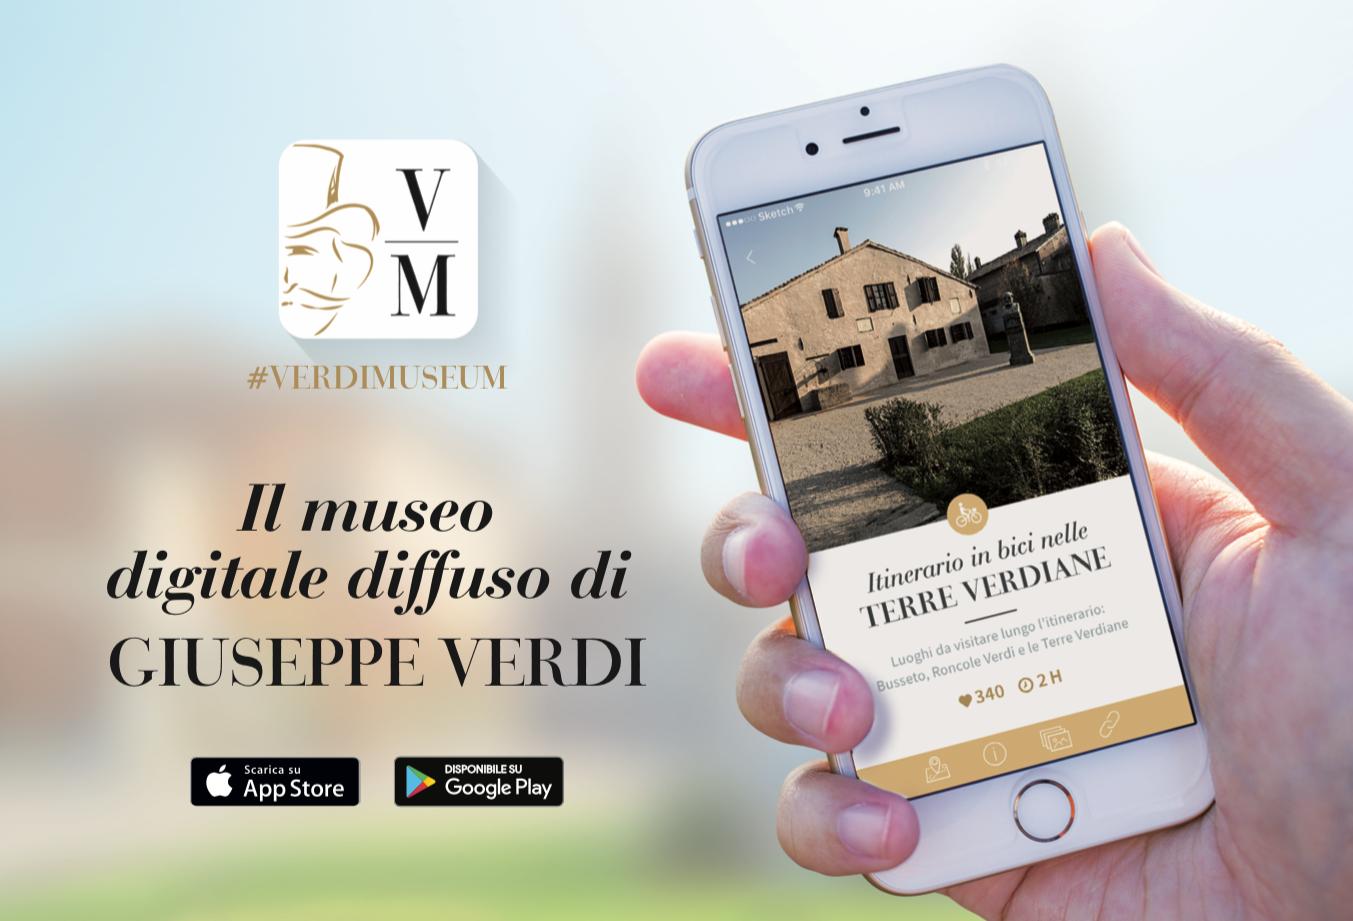 Cos'è: #VerdiMuseum è una App concepita pe...